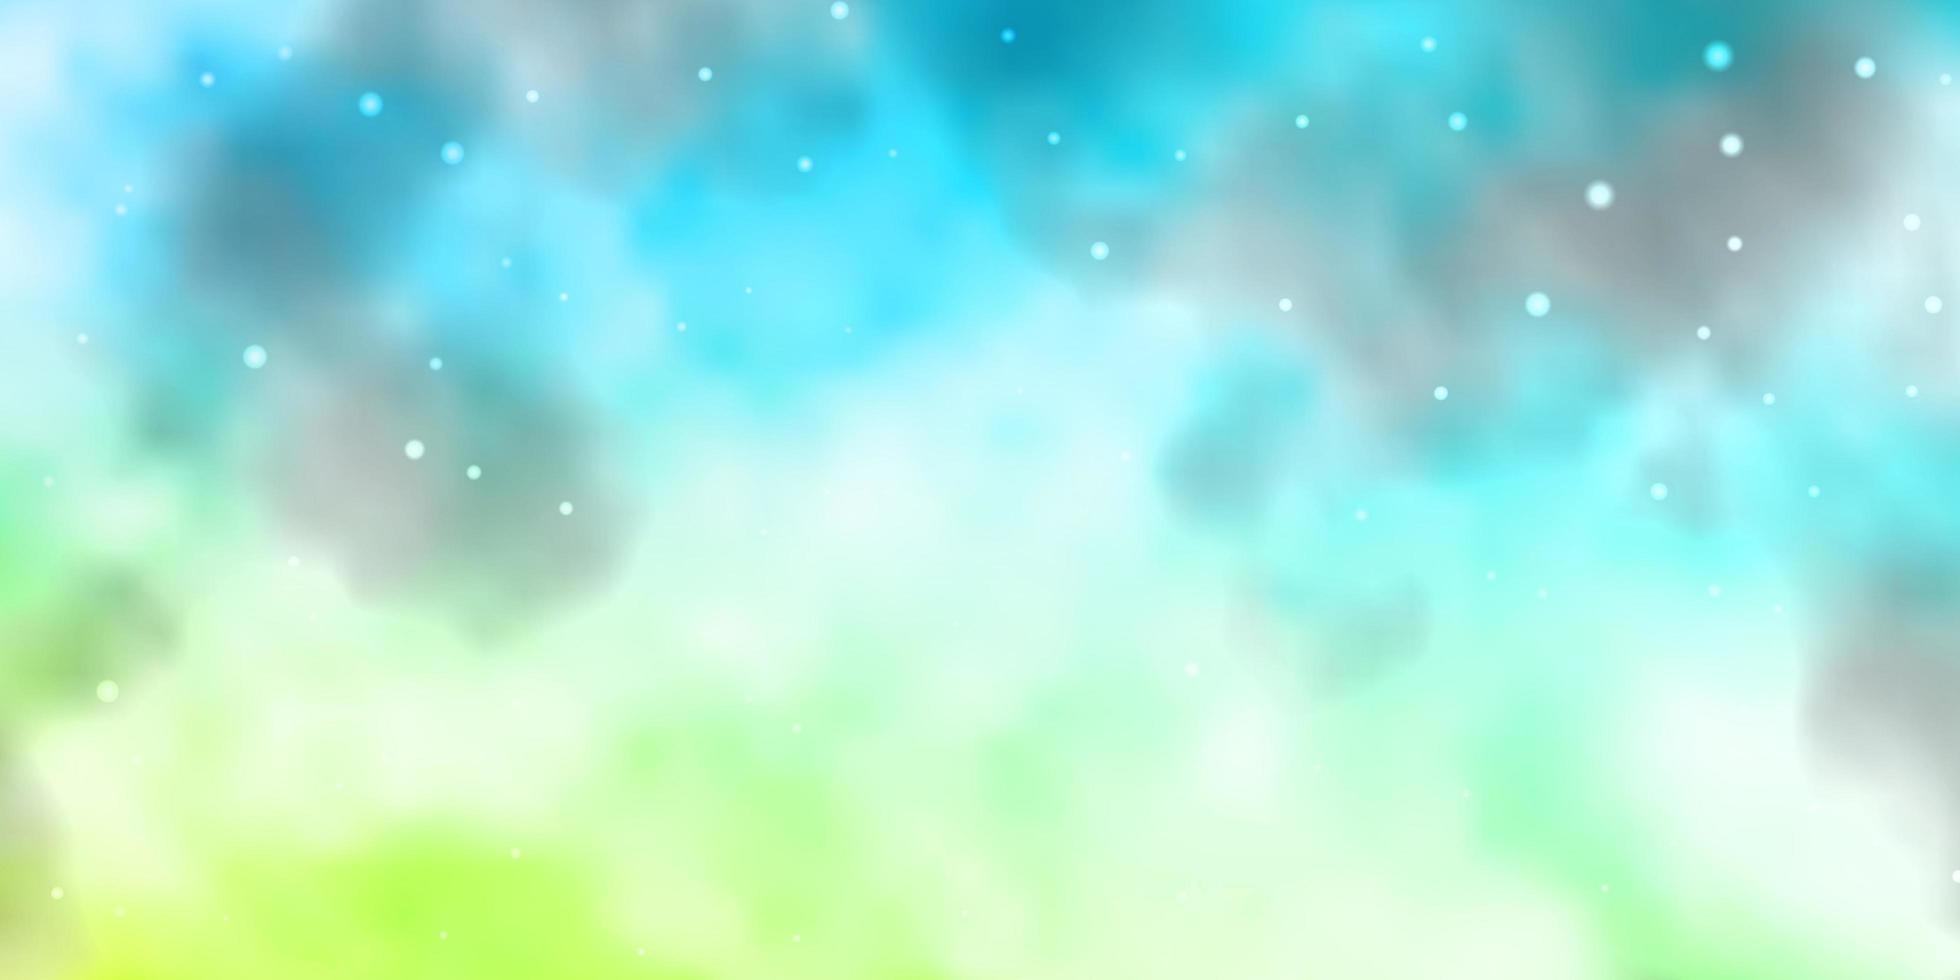 de fundo vector azul, verde claro com estrelas coloridas.